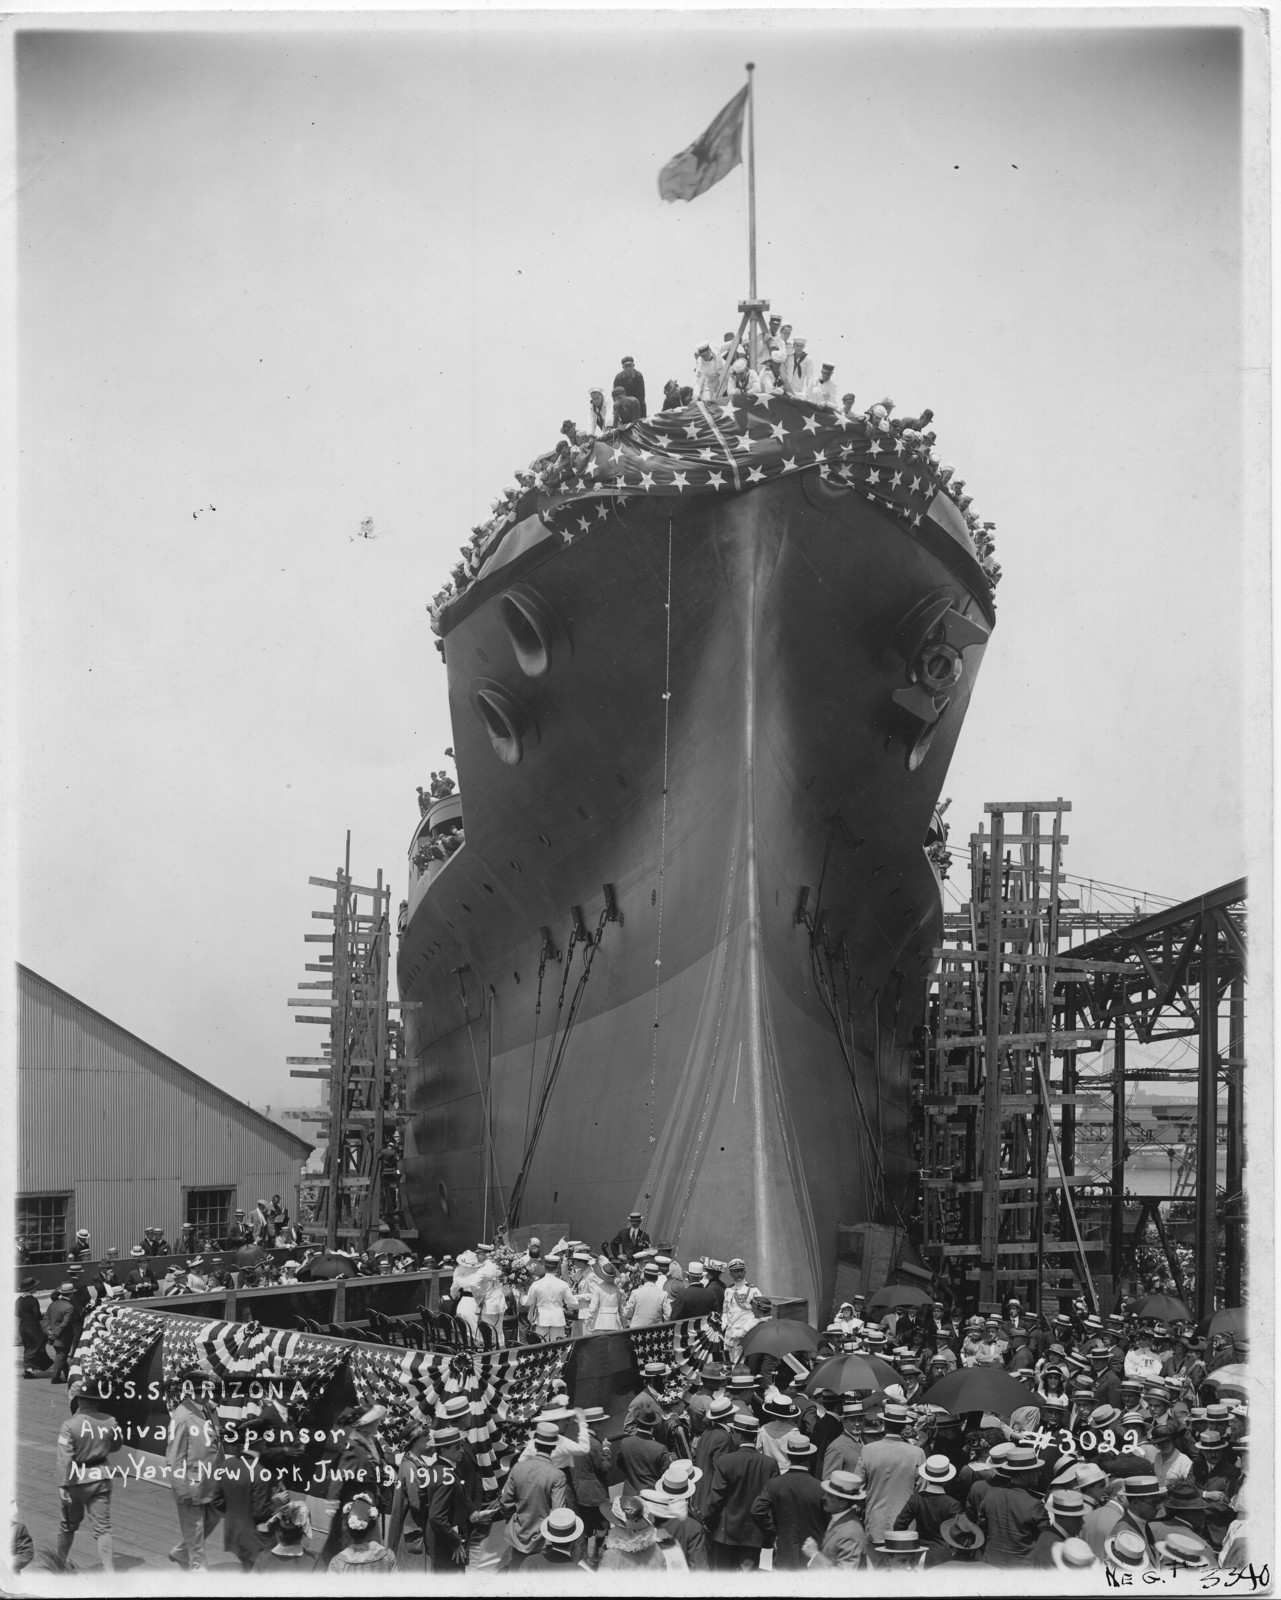 USS Arizona, Arrival of Sponsor, Navy Yard, New York